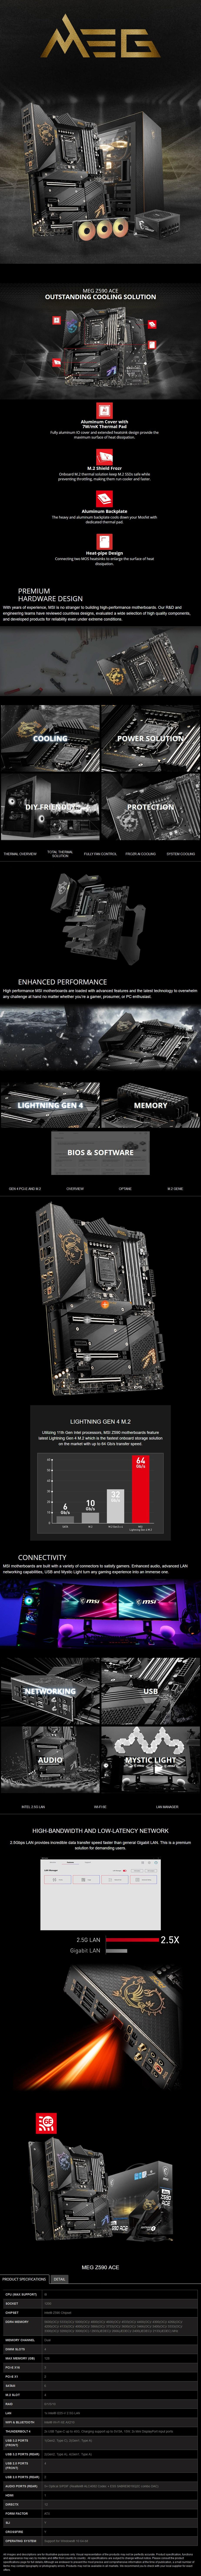 msi-meg-z590-ace-lga-1200-atx-motherboard-ac42940-7.jpg